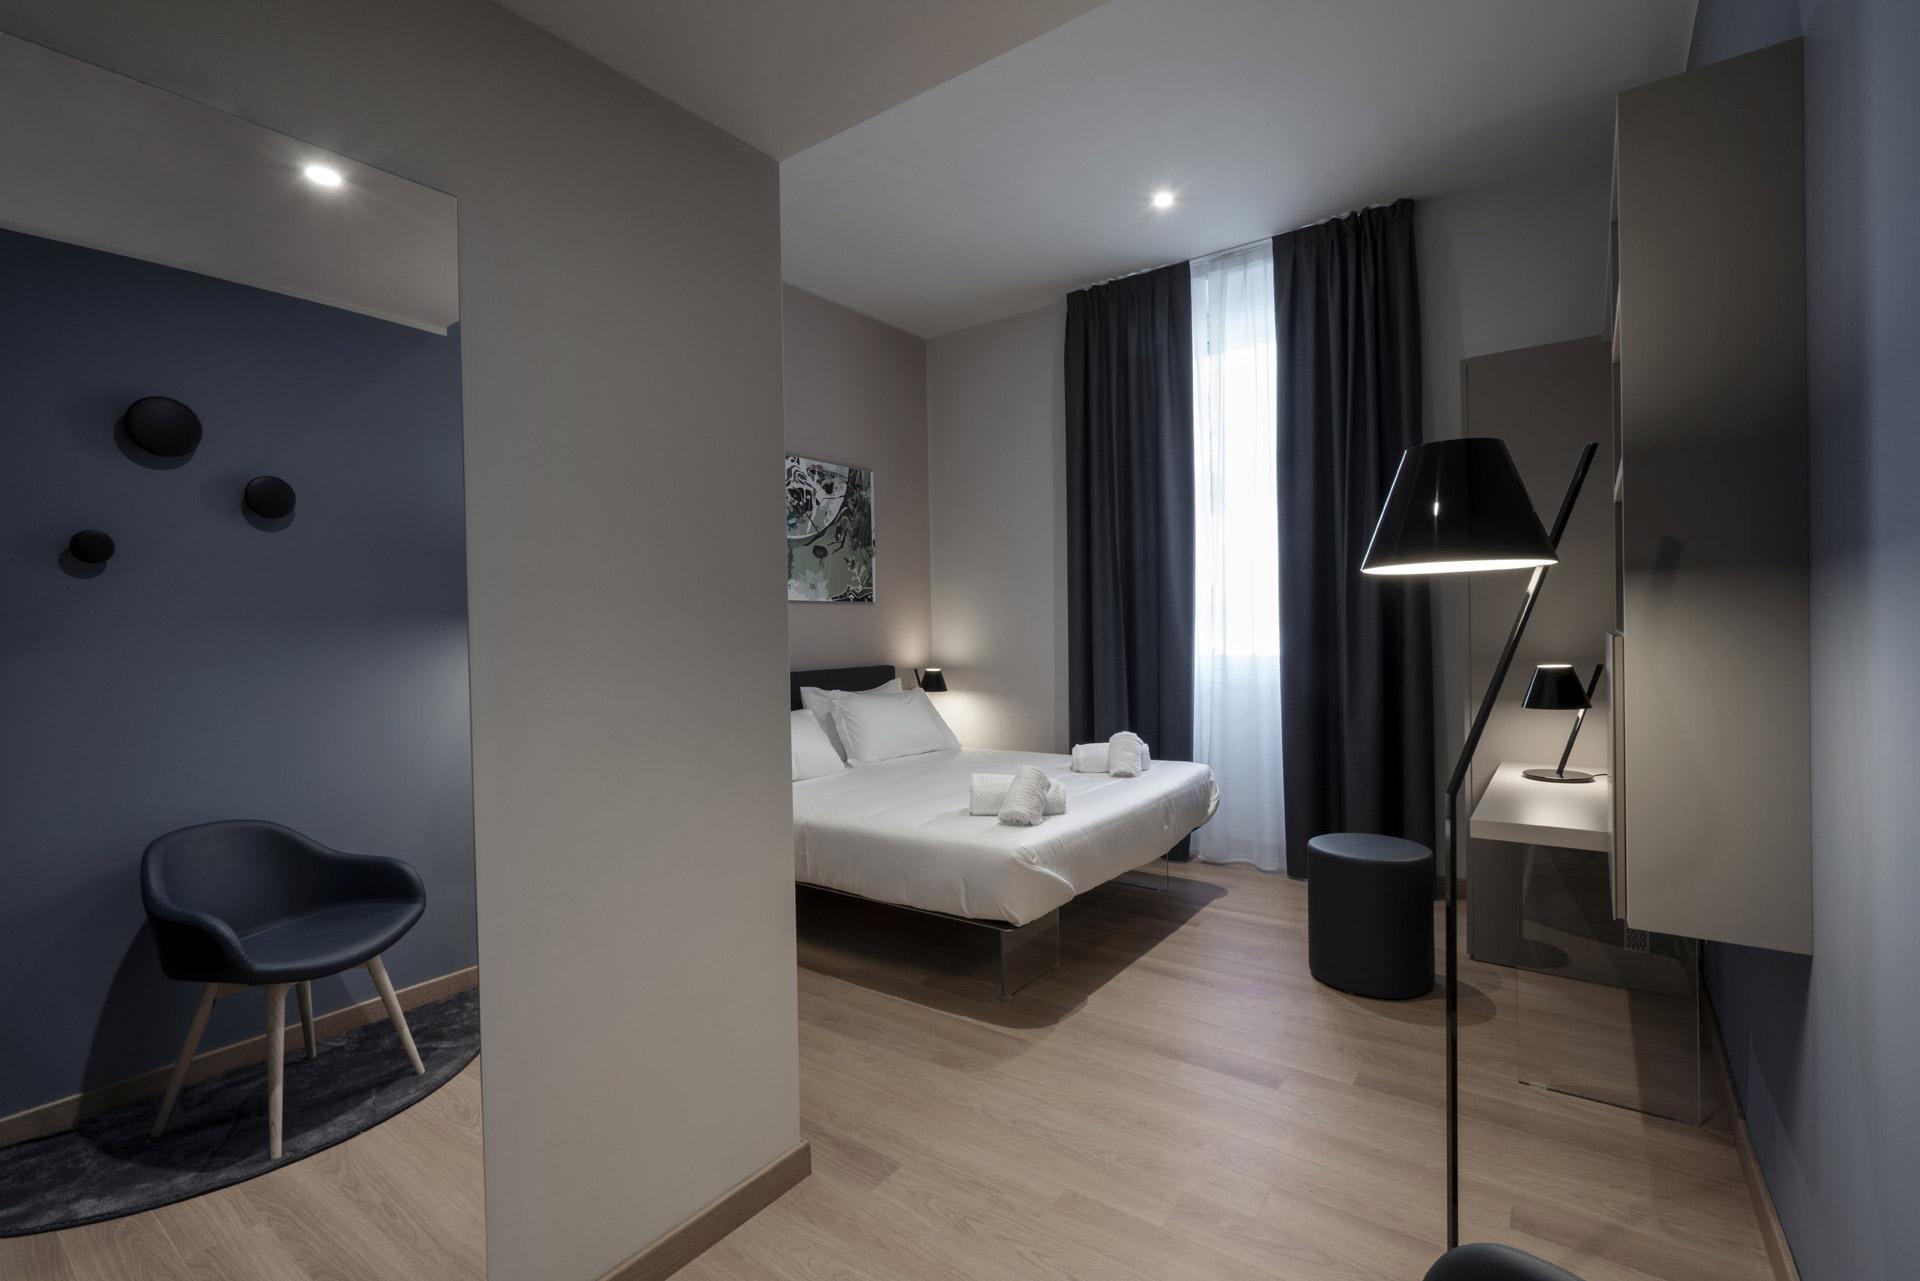 21WOL HOTEL CITTA' STUDI